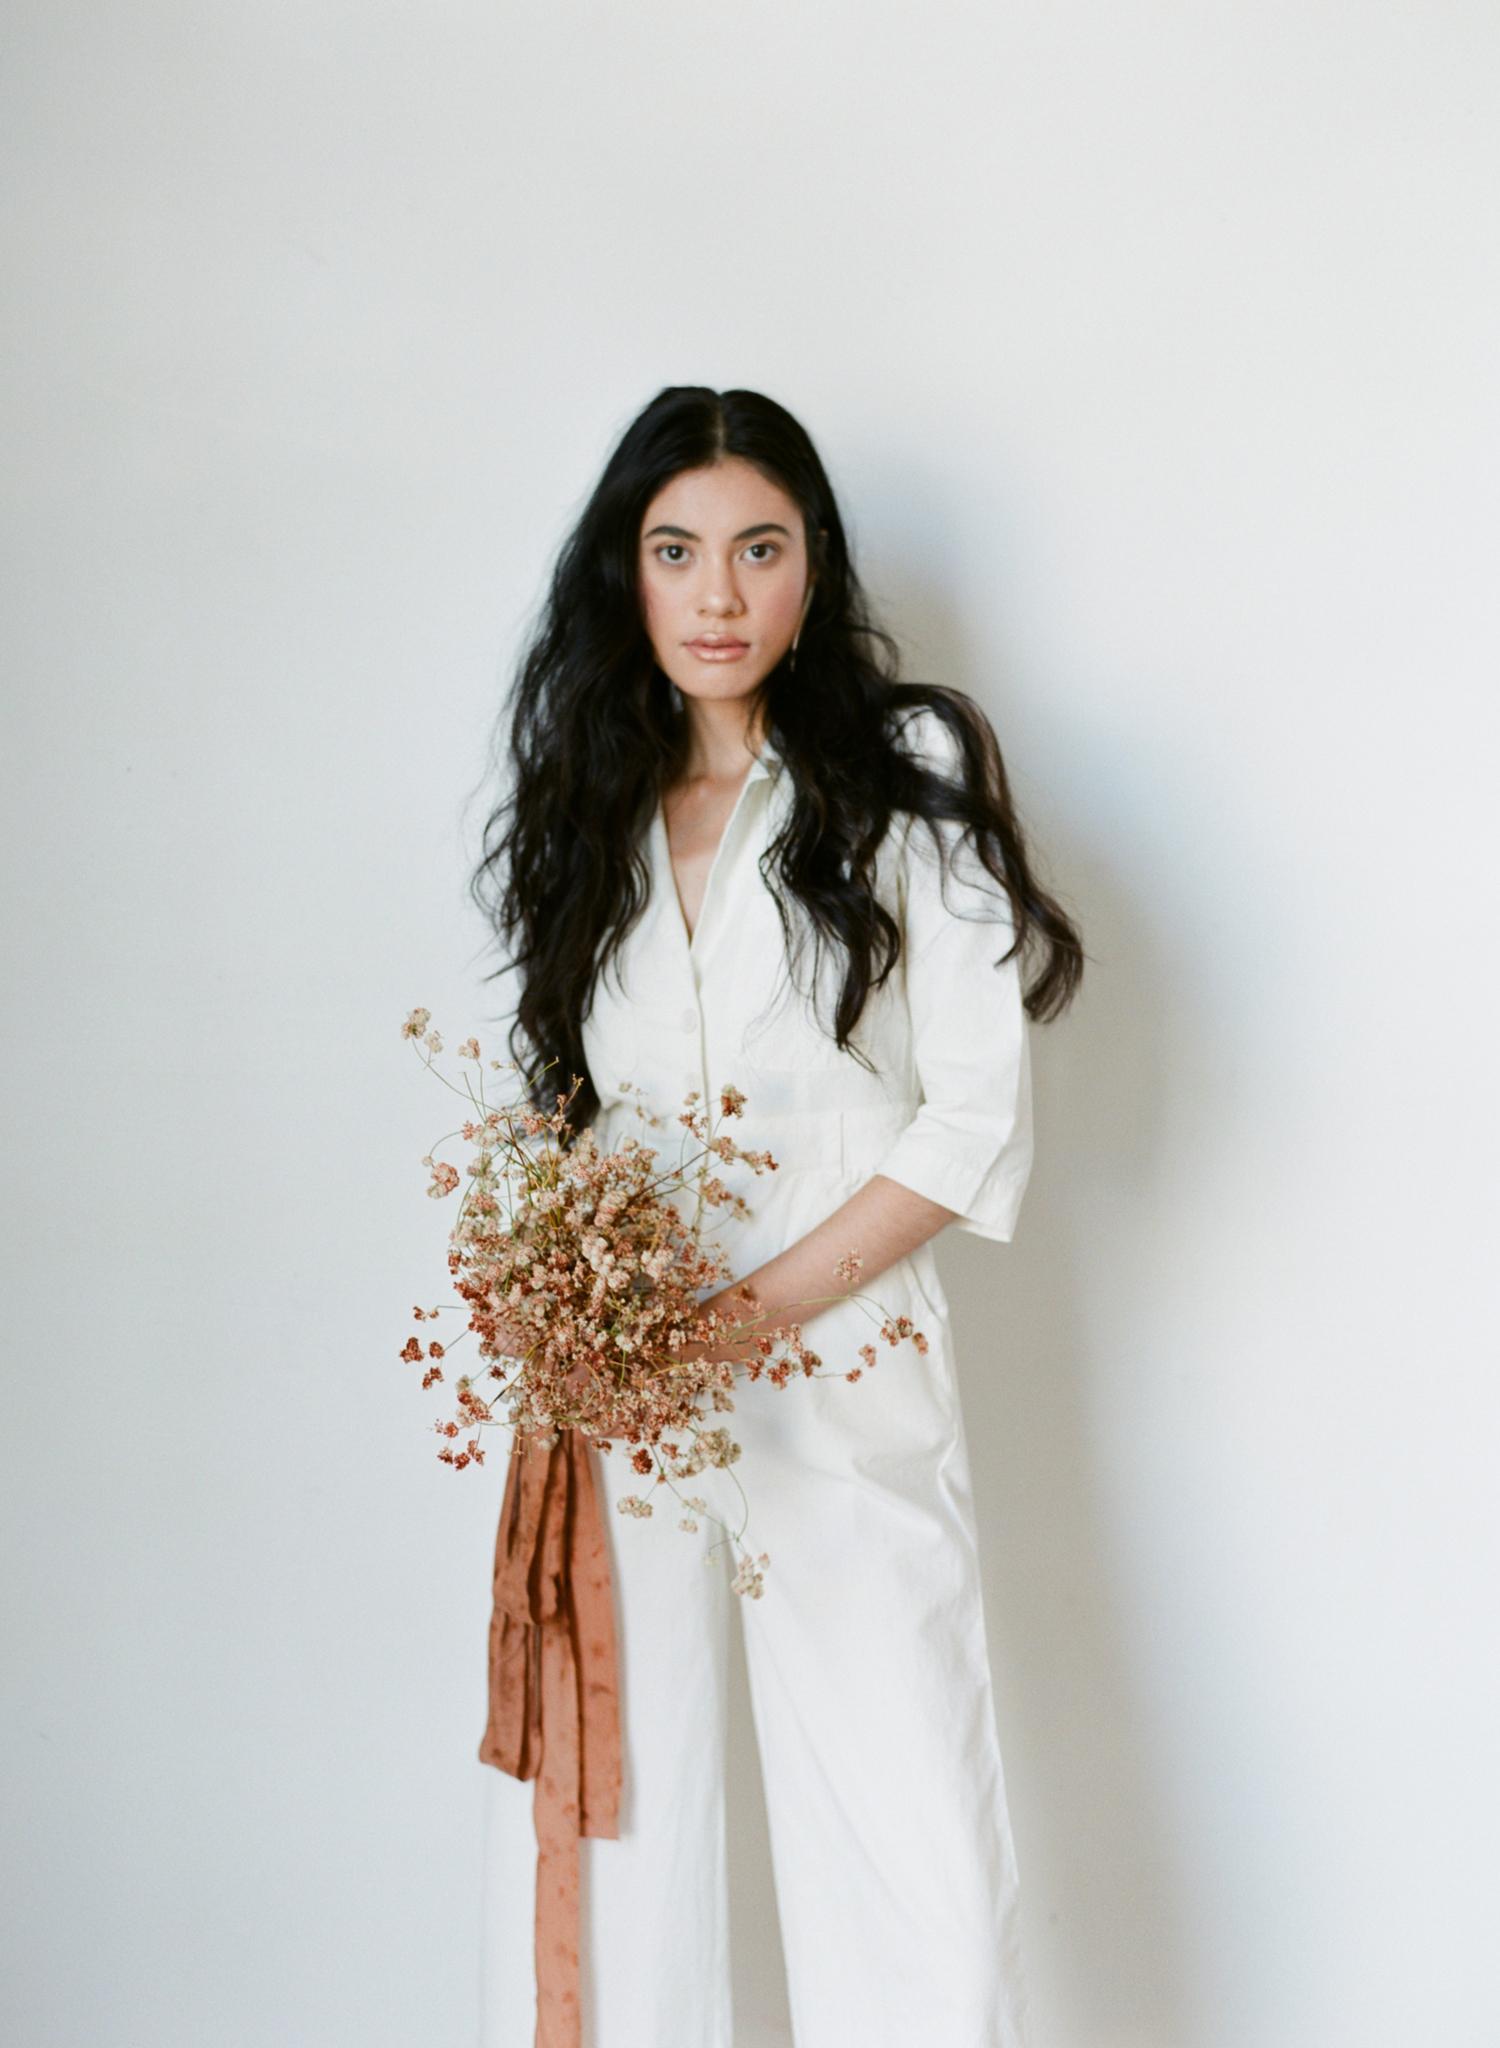 single flower wedding bouquet dried wildflowers held by bride in jumpsuit